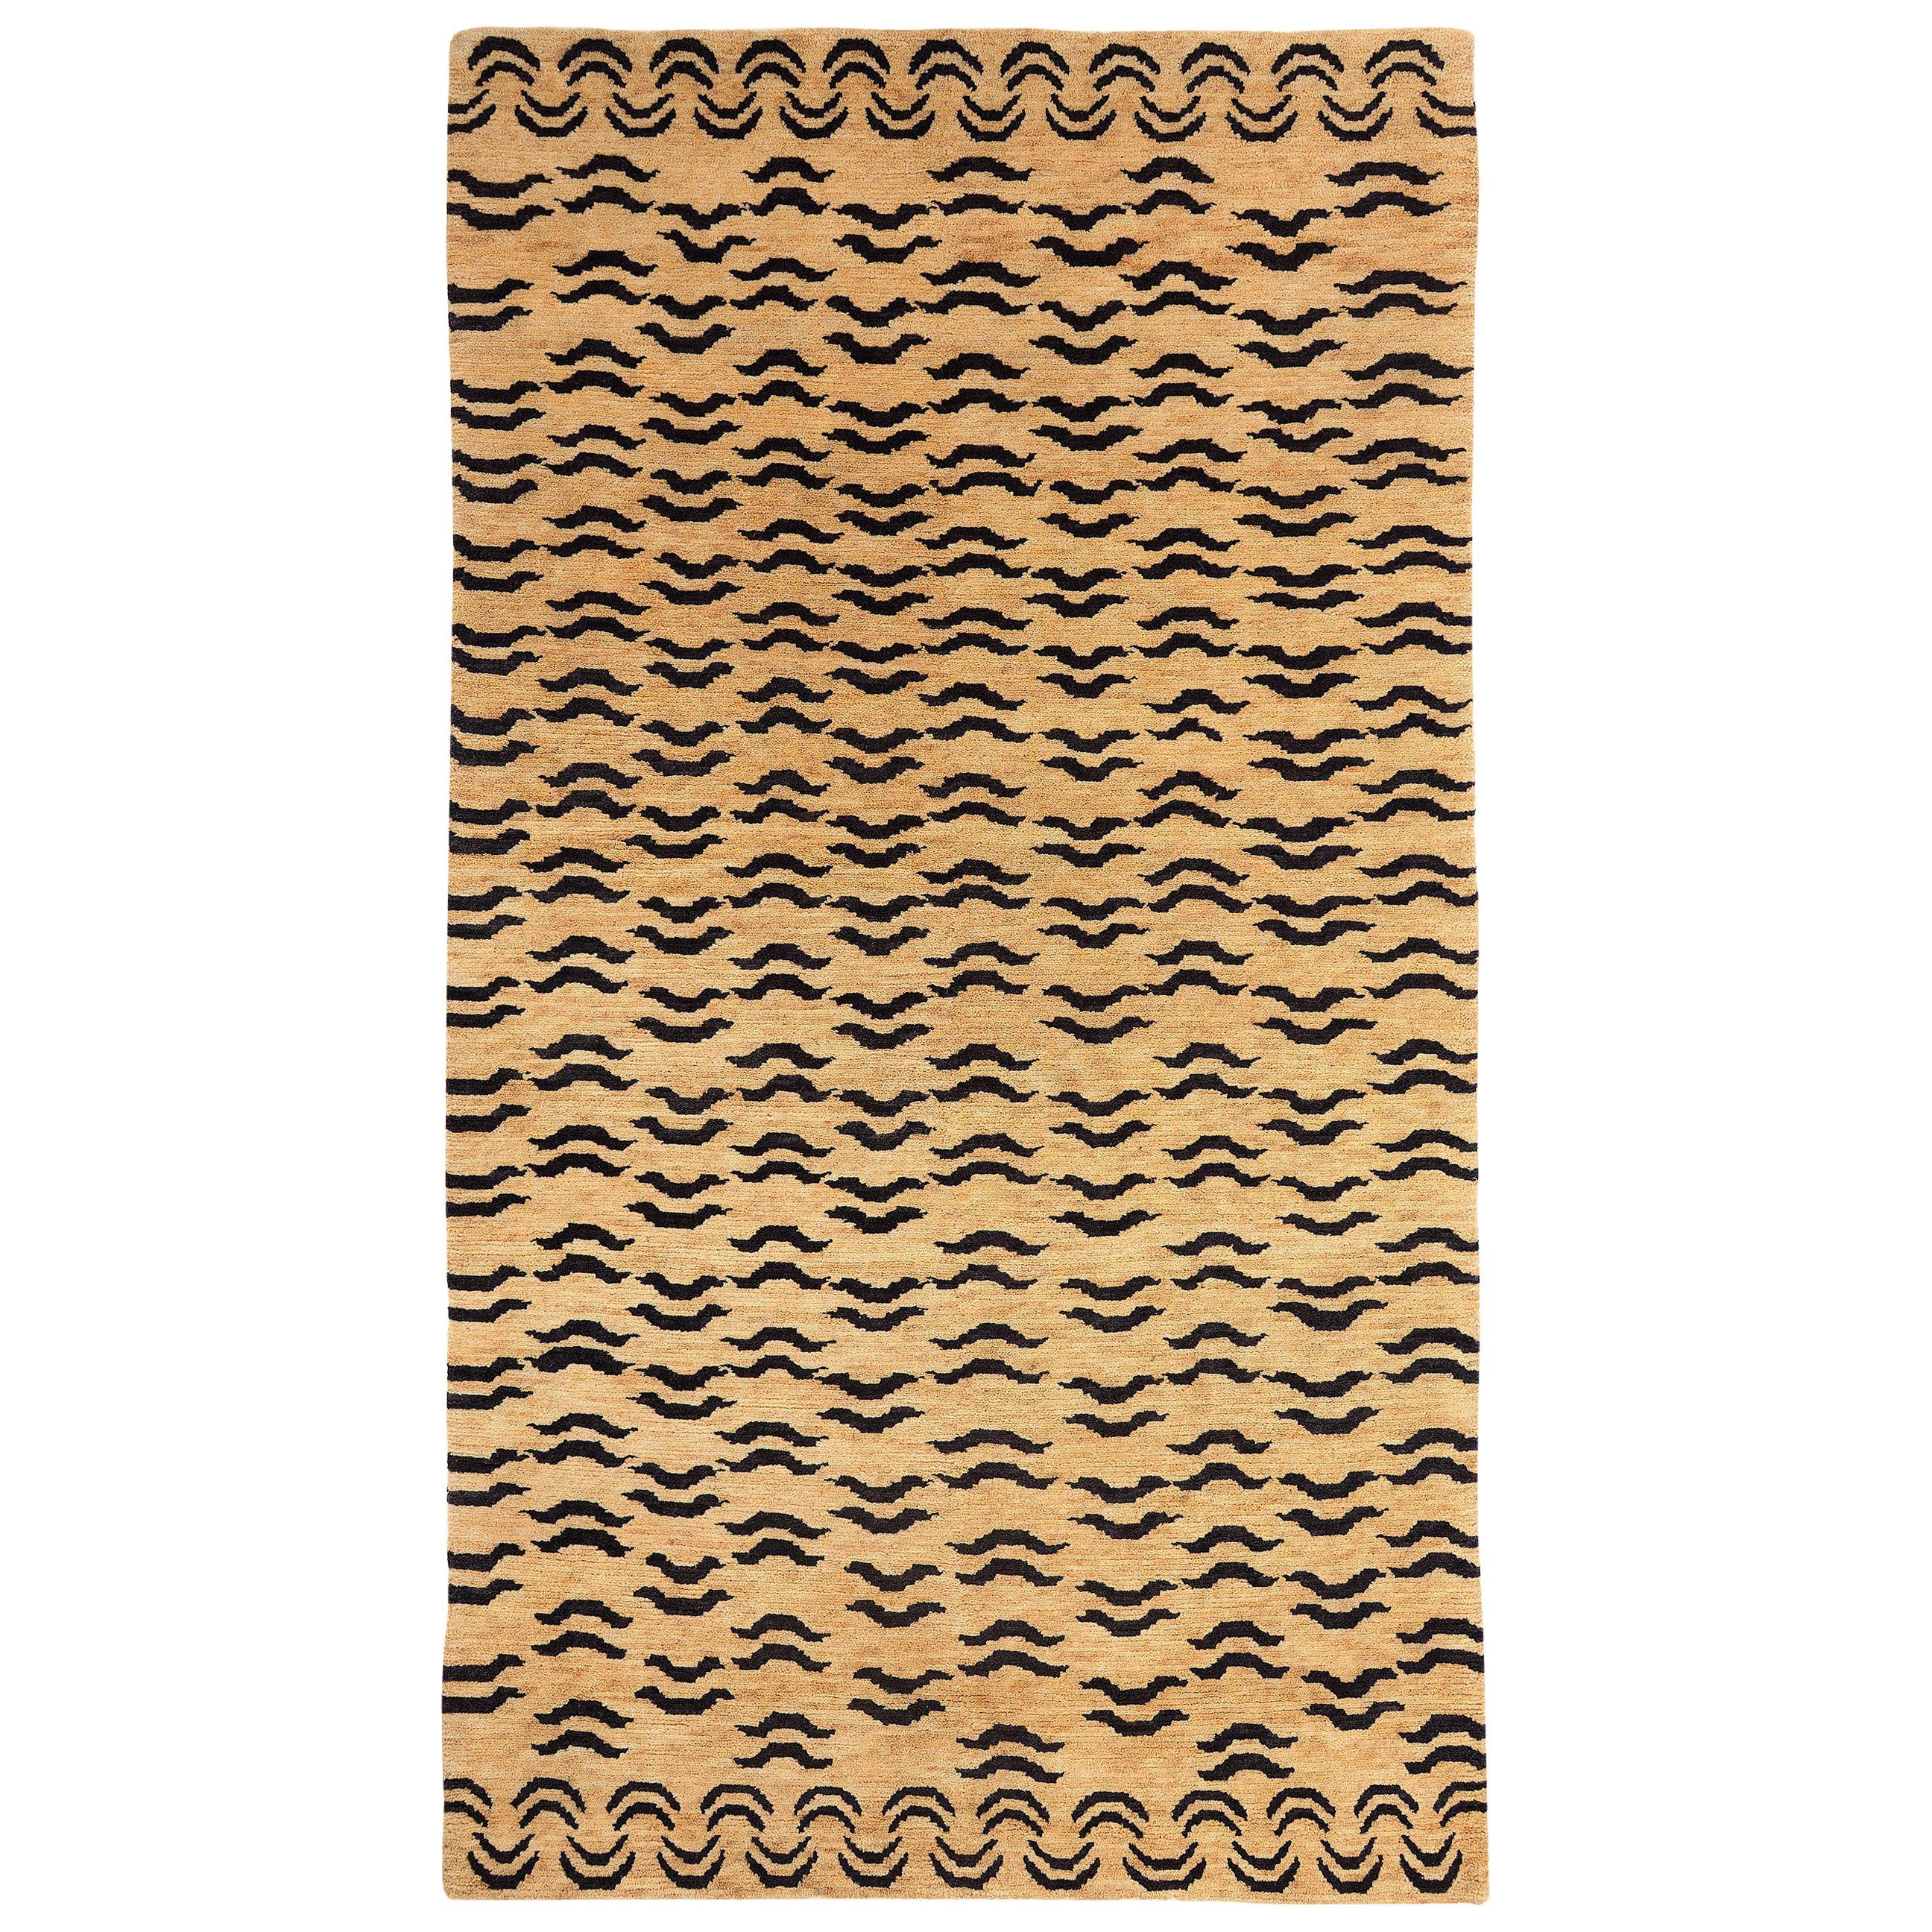 Black and Golden Tan Wool Tibetan Tiger Area Rug